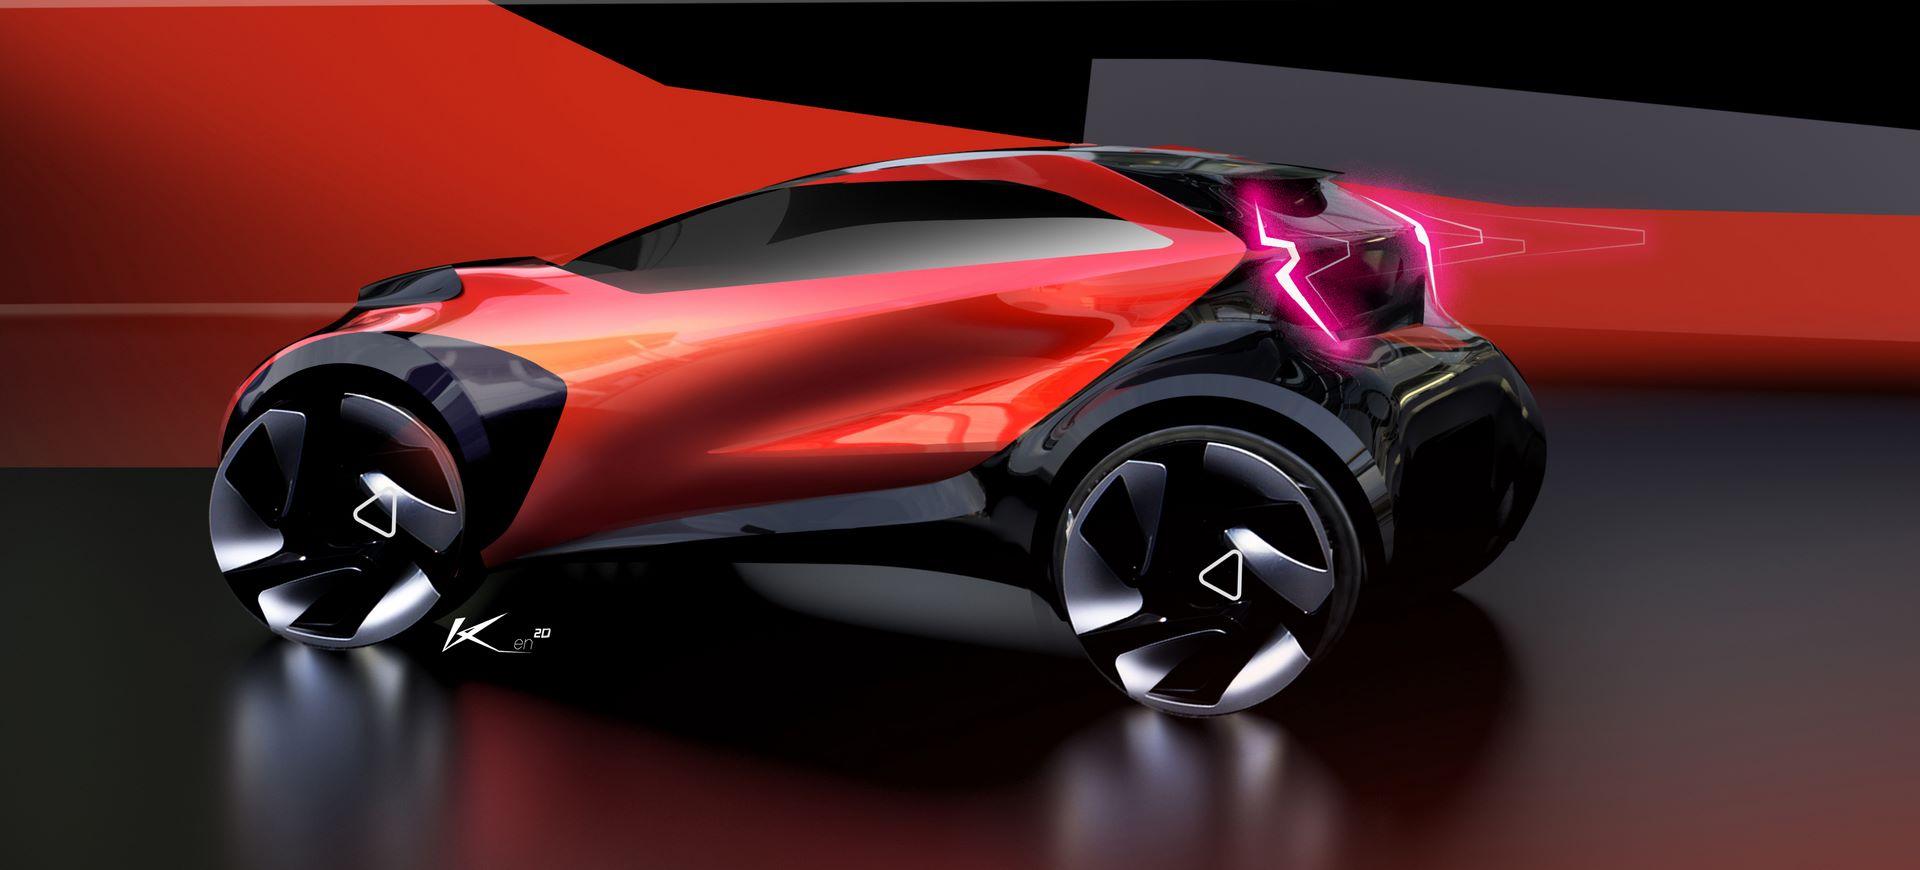 Toyota-Aygo-X-prologue-4